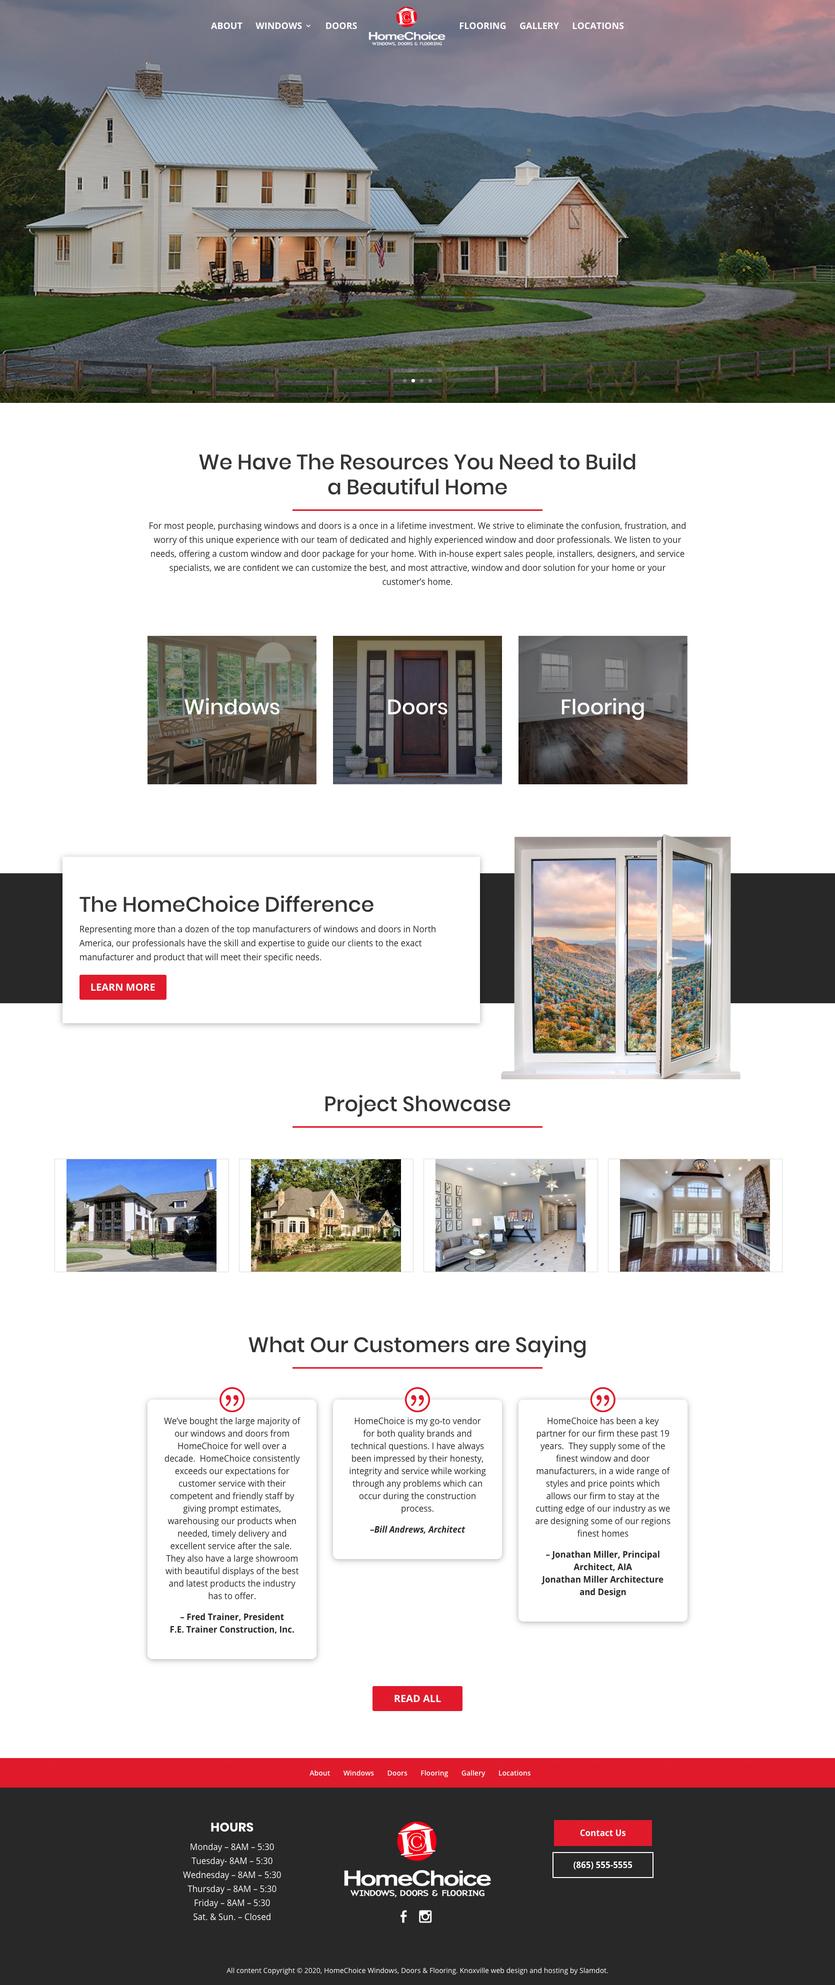 HomeChoice Windows, Doors & Flooring